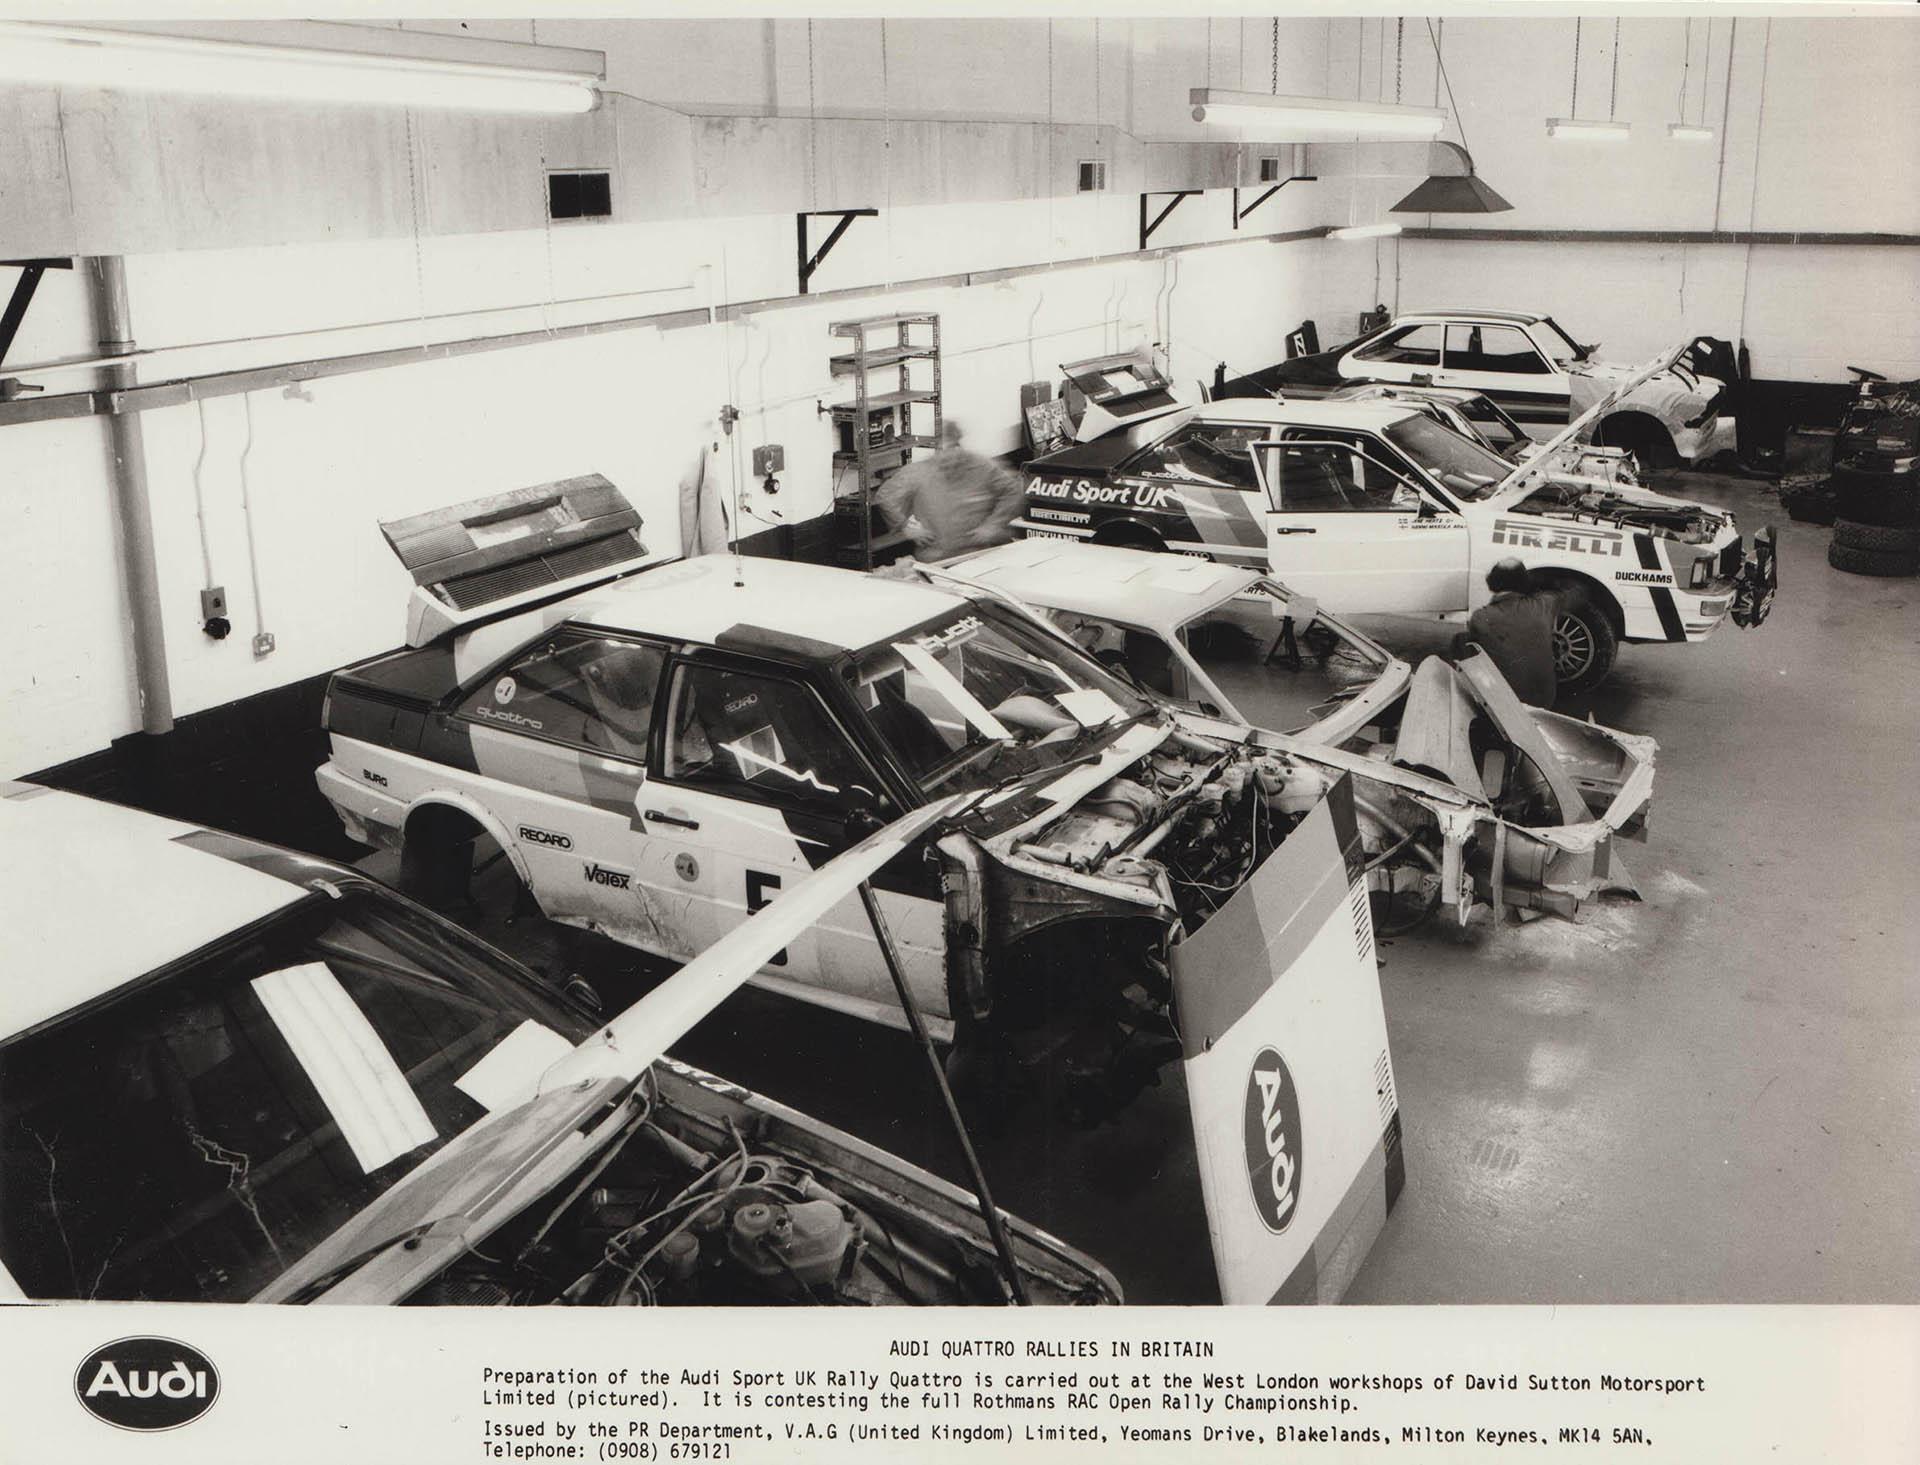 Audi Sport UK Press Release 18/02/1982